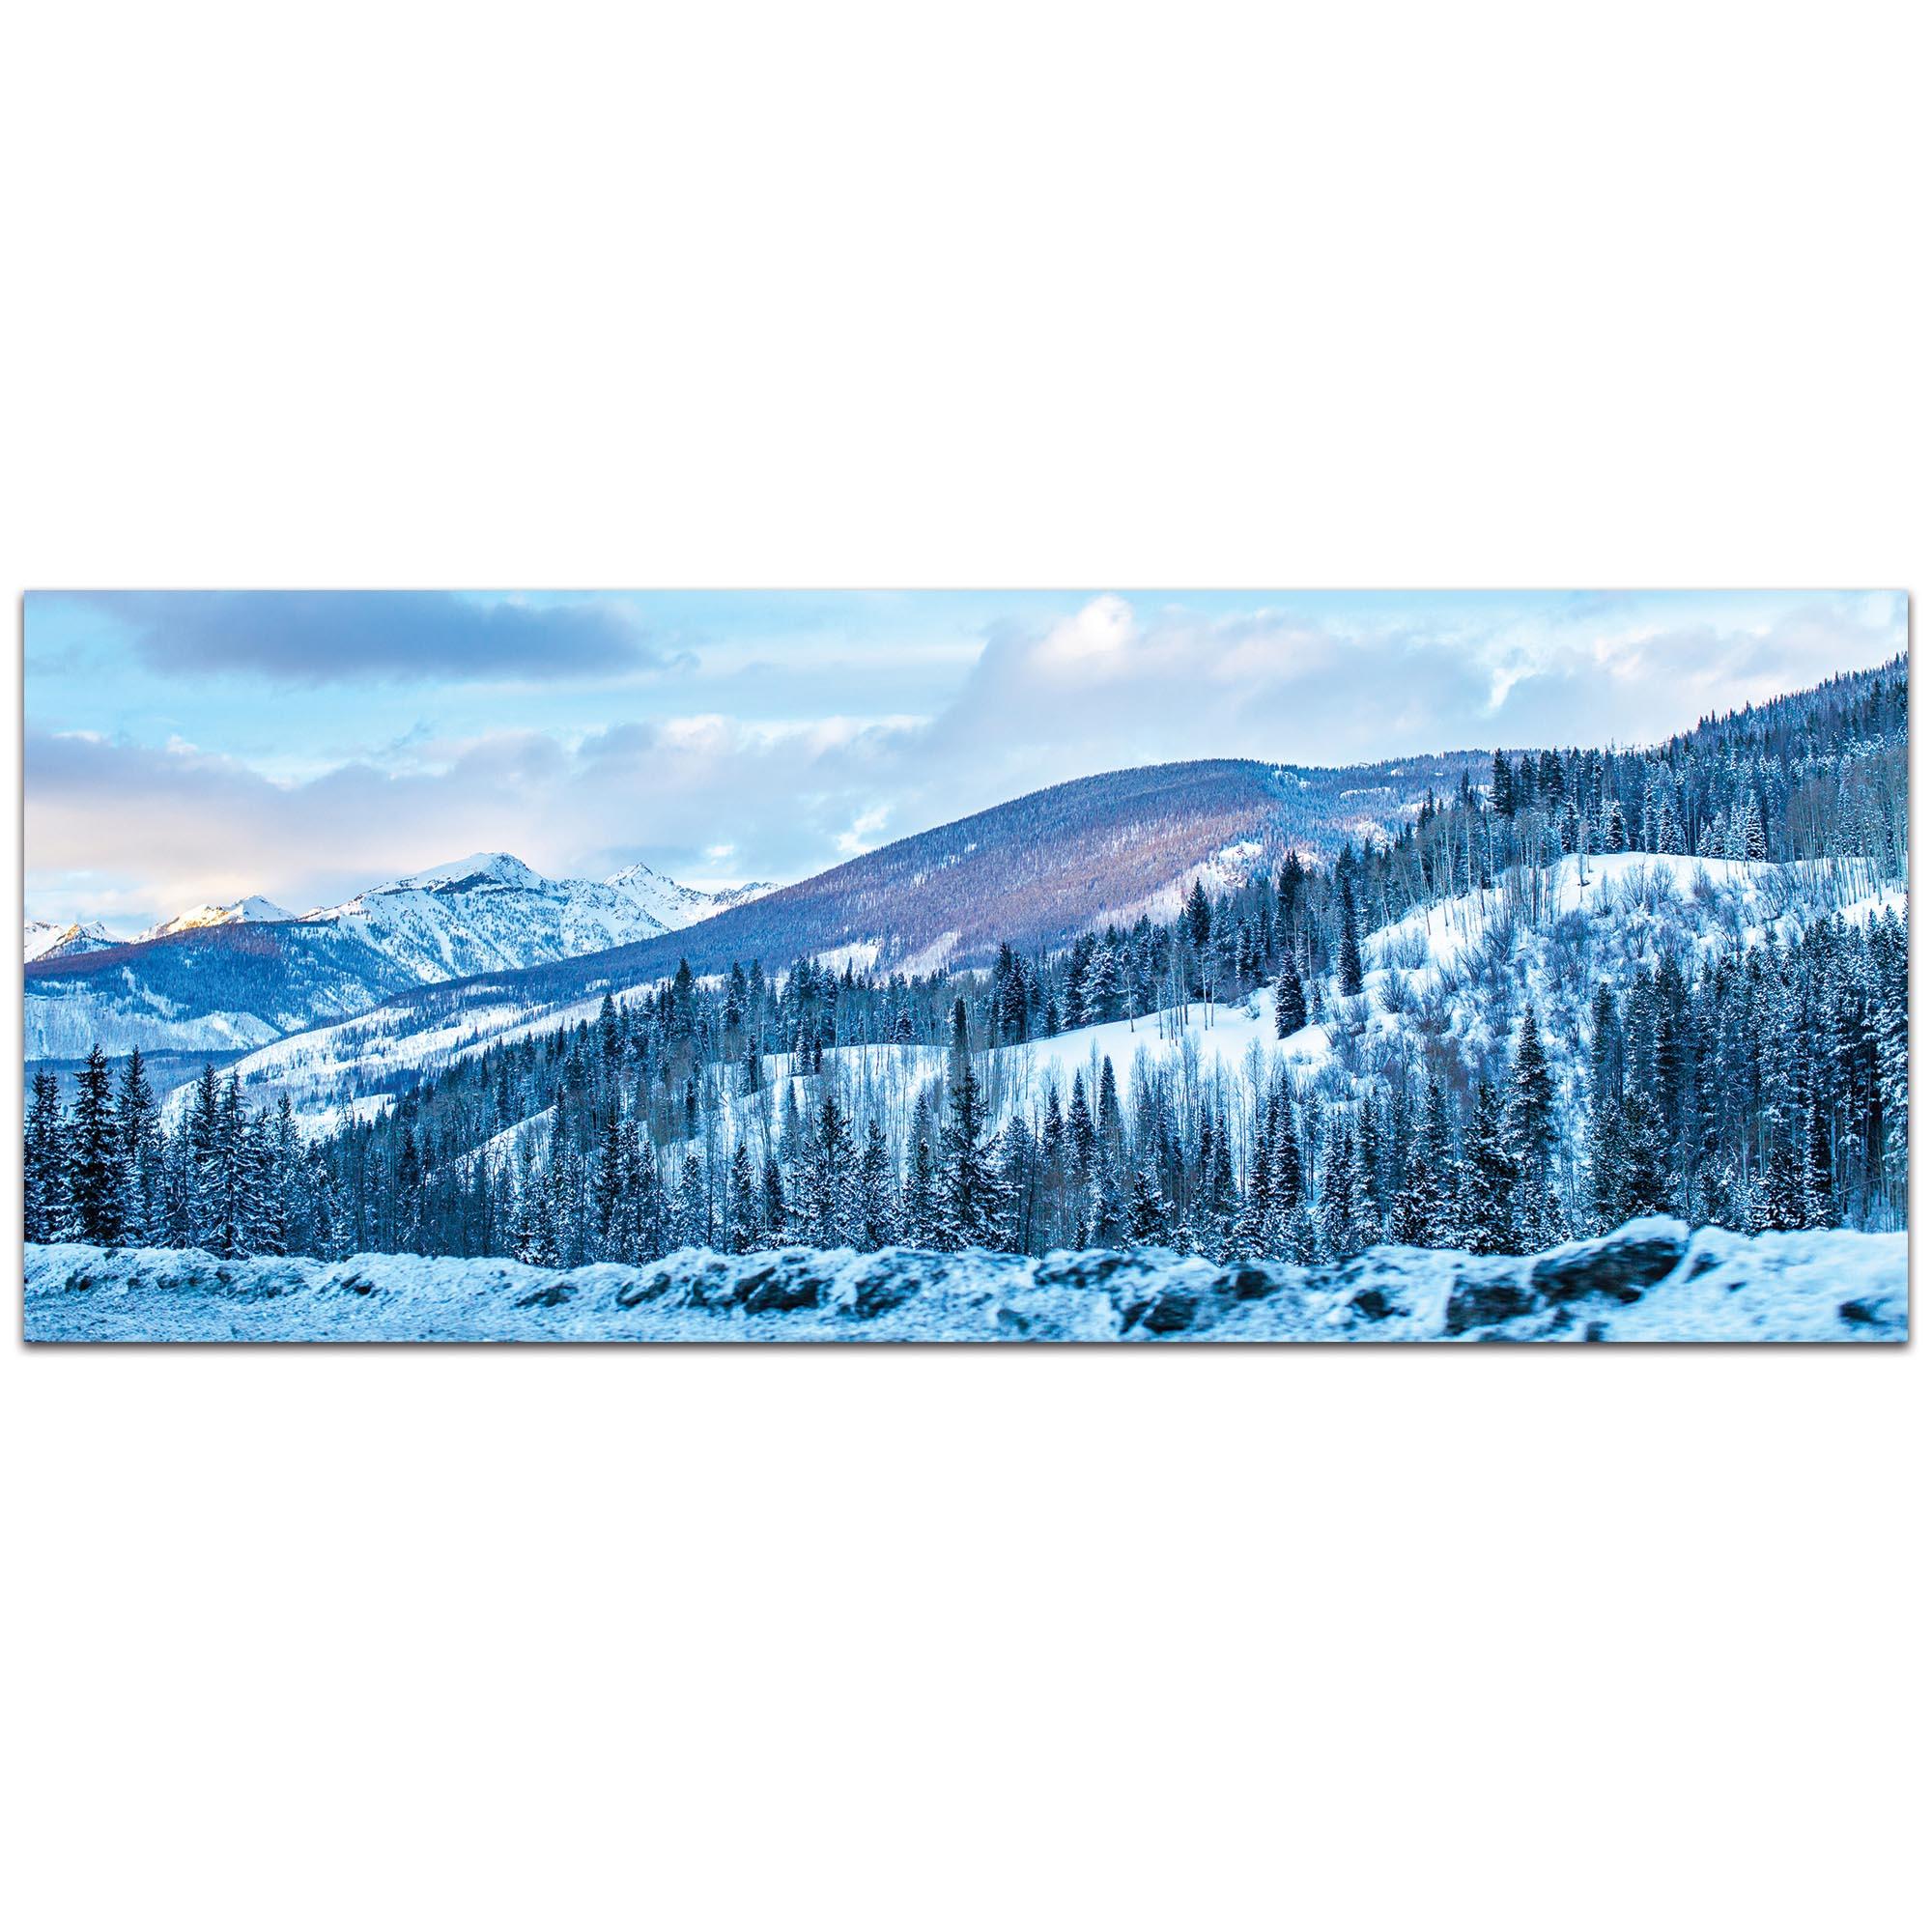 Landscape Photography 'The Slopes' - Winter Scene Art on Metal or Plexiglass